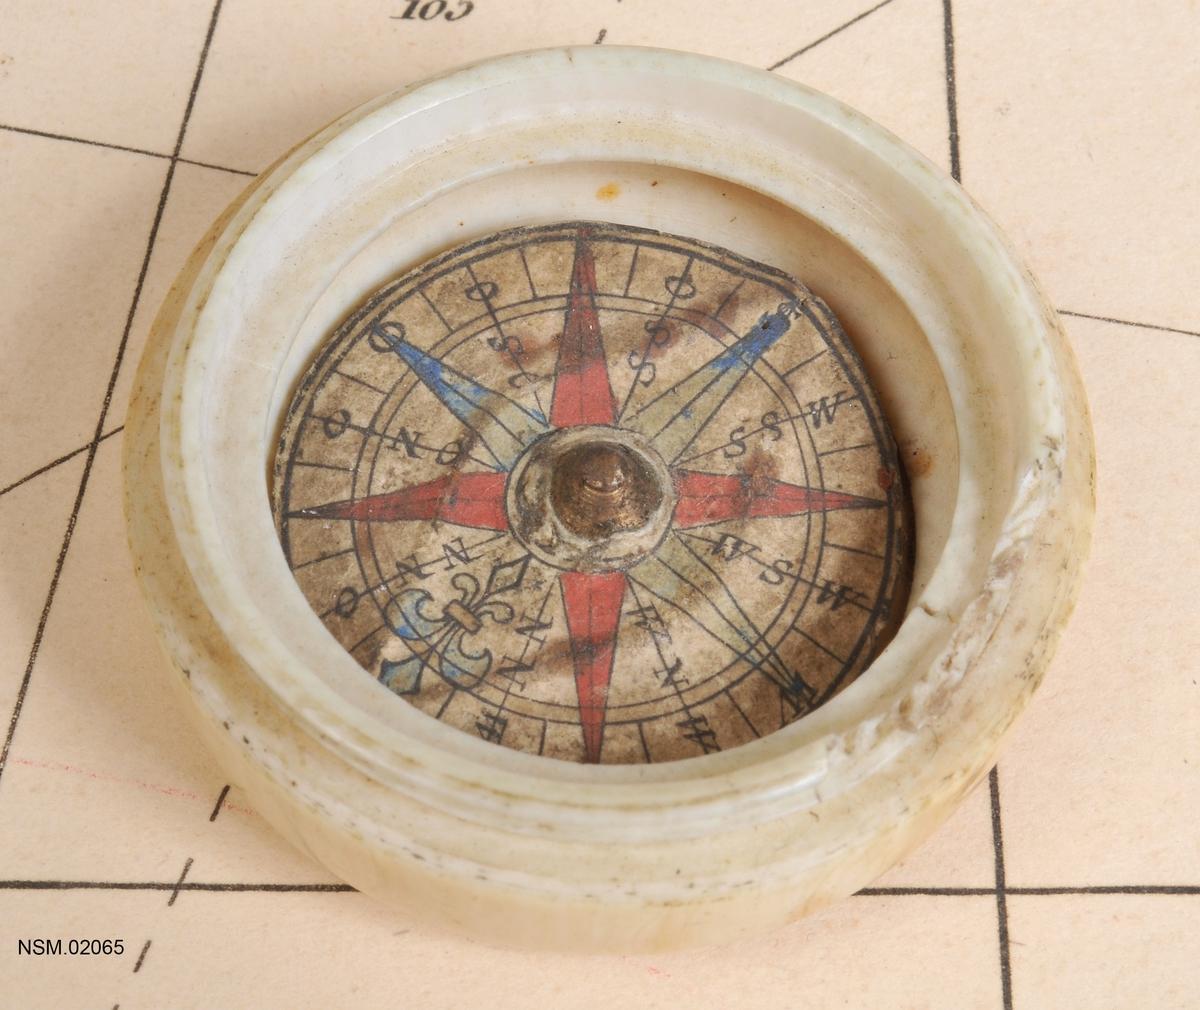 Miniatyrkompass i elfenbenseske (lite kompass  i eske med skrulokk).